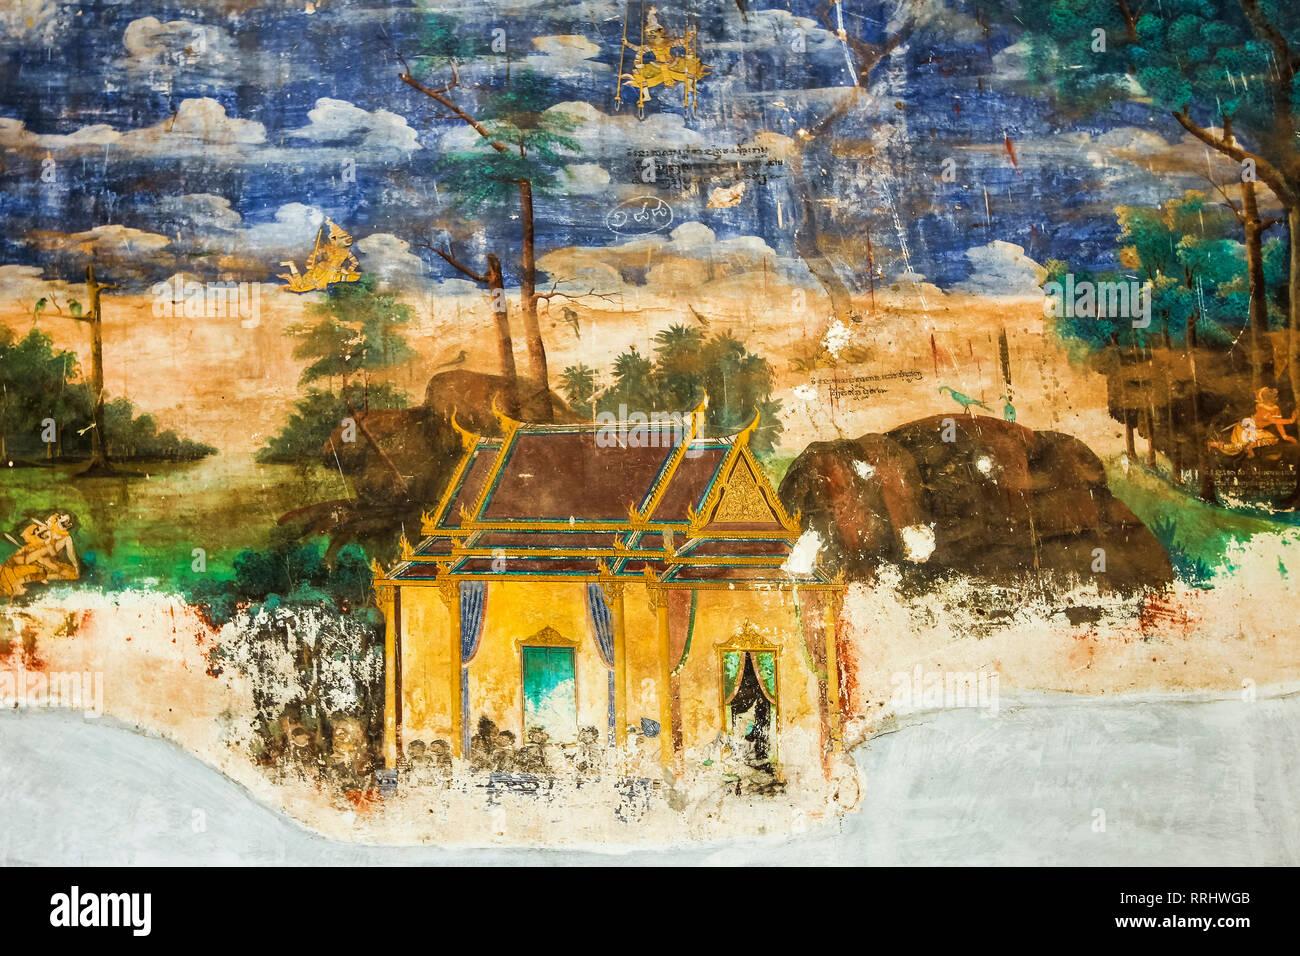 Fresco of the Reamker, the Khmer version of the Ramayana epic poem, Royal Palace cloisters, Royal Palace, Phnom Penh, Cambodia, Indochina - Stock Image